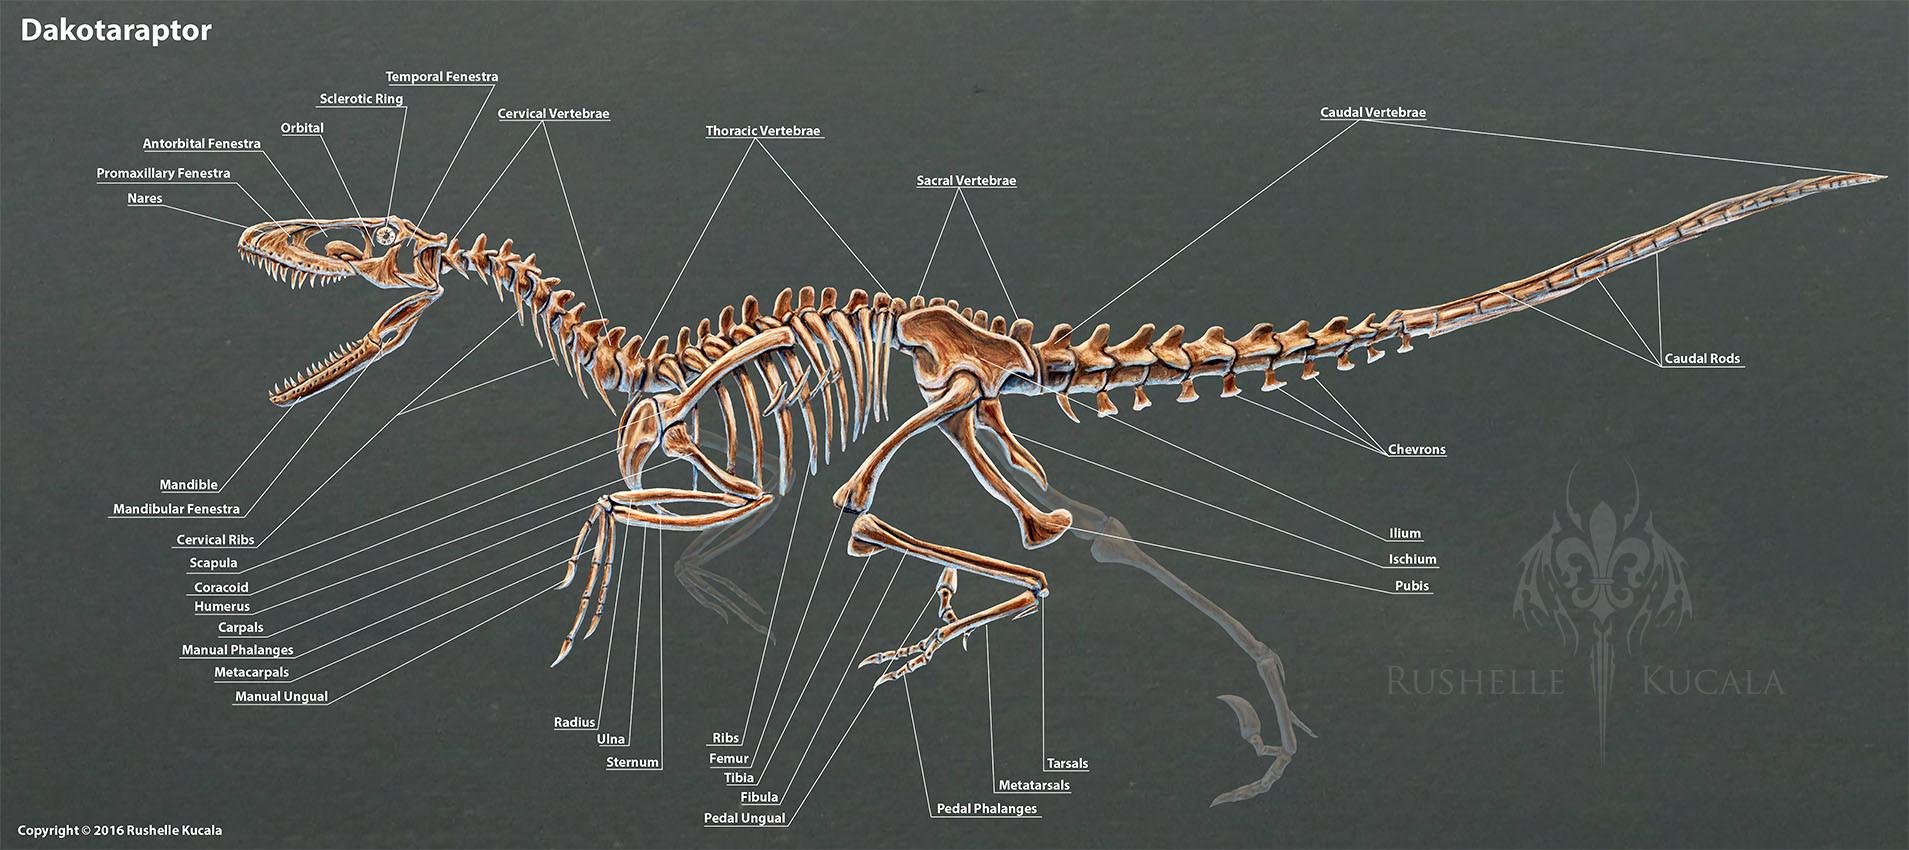 rushelle-kucala-dakotaraptorskeletonlabe